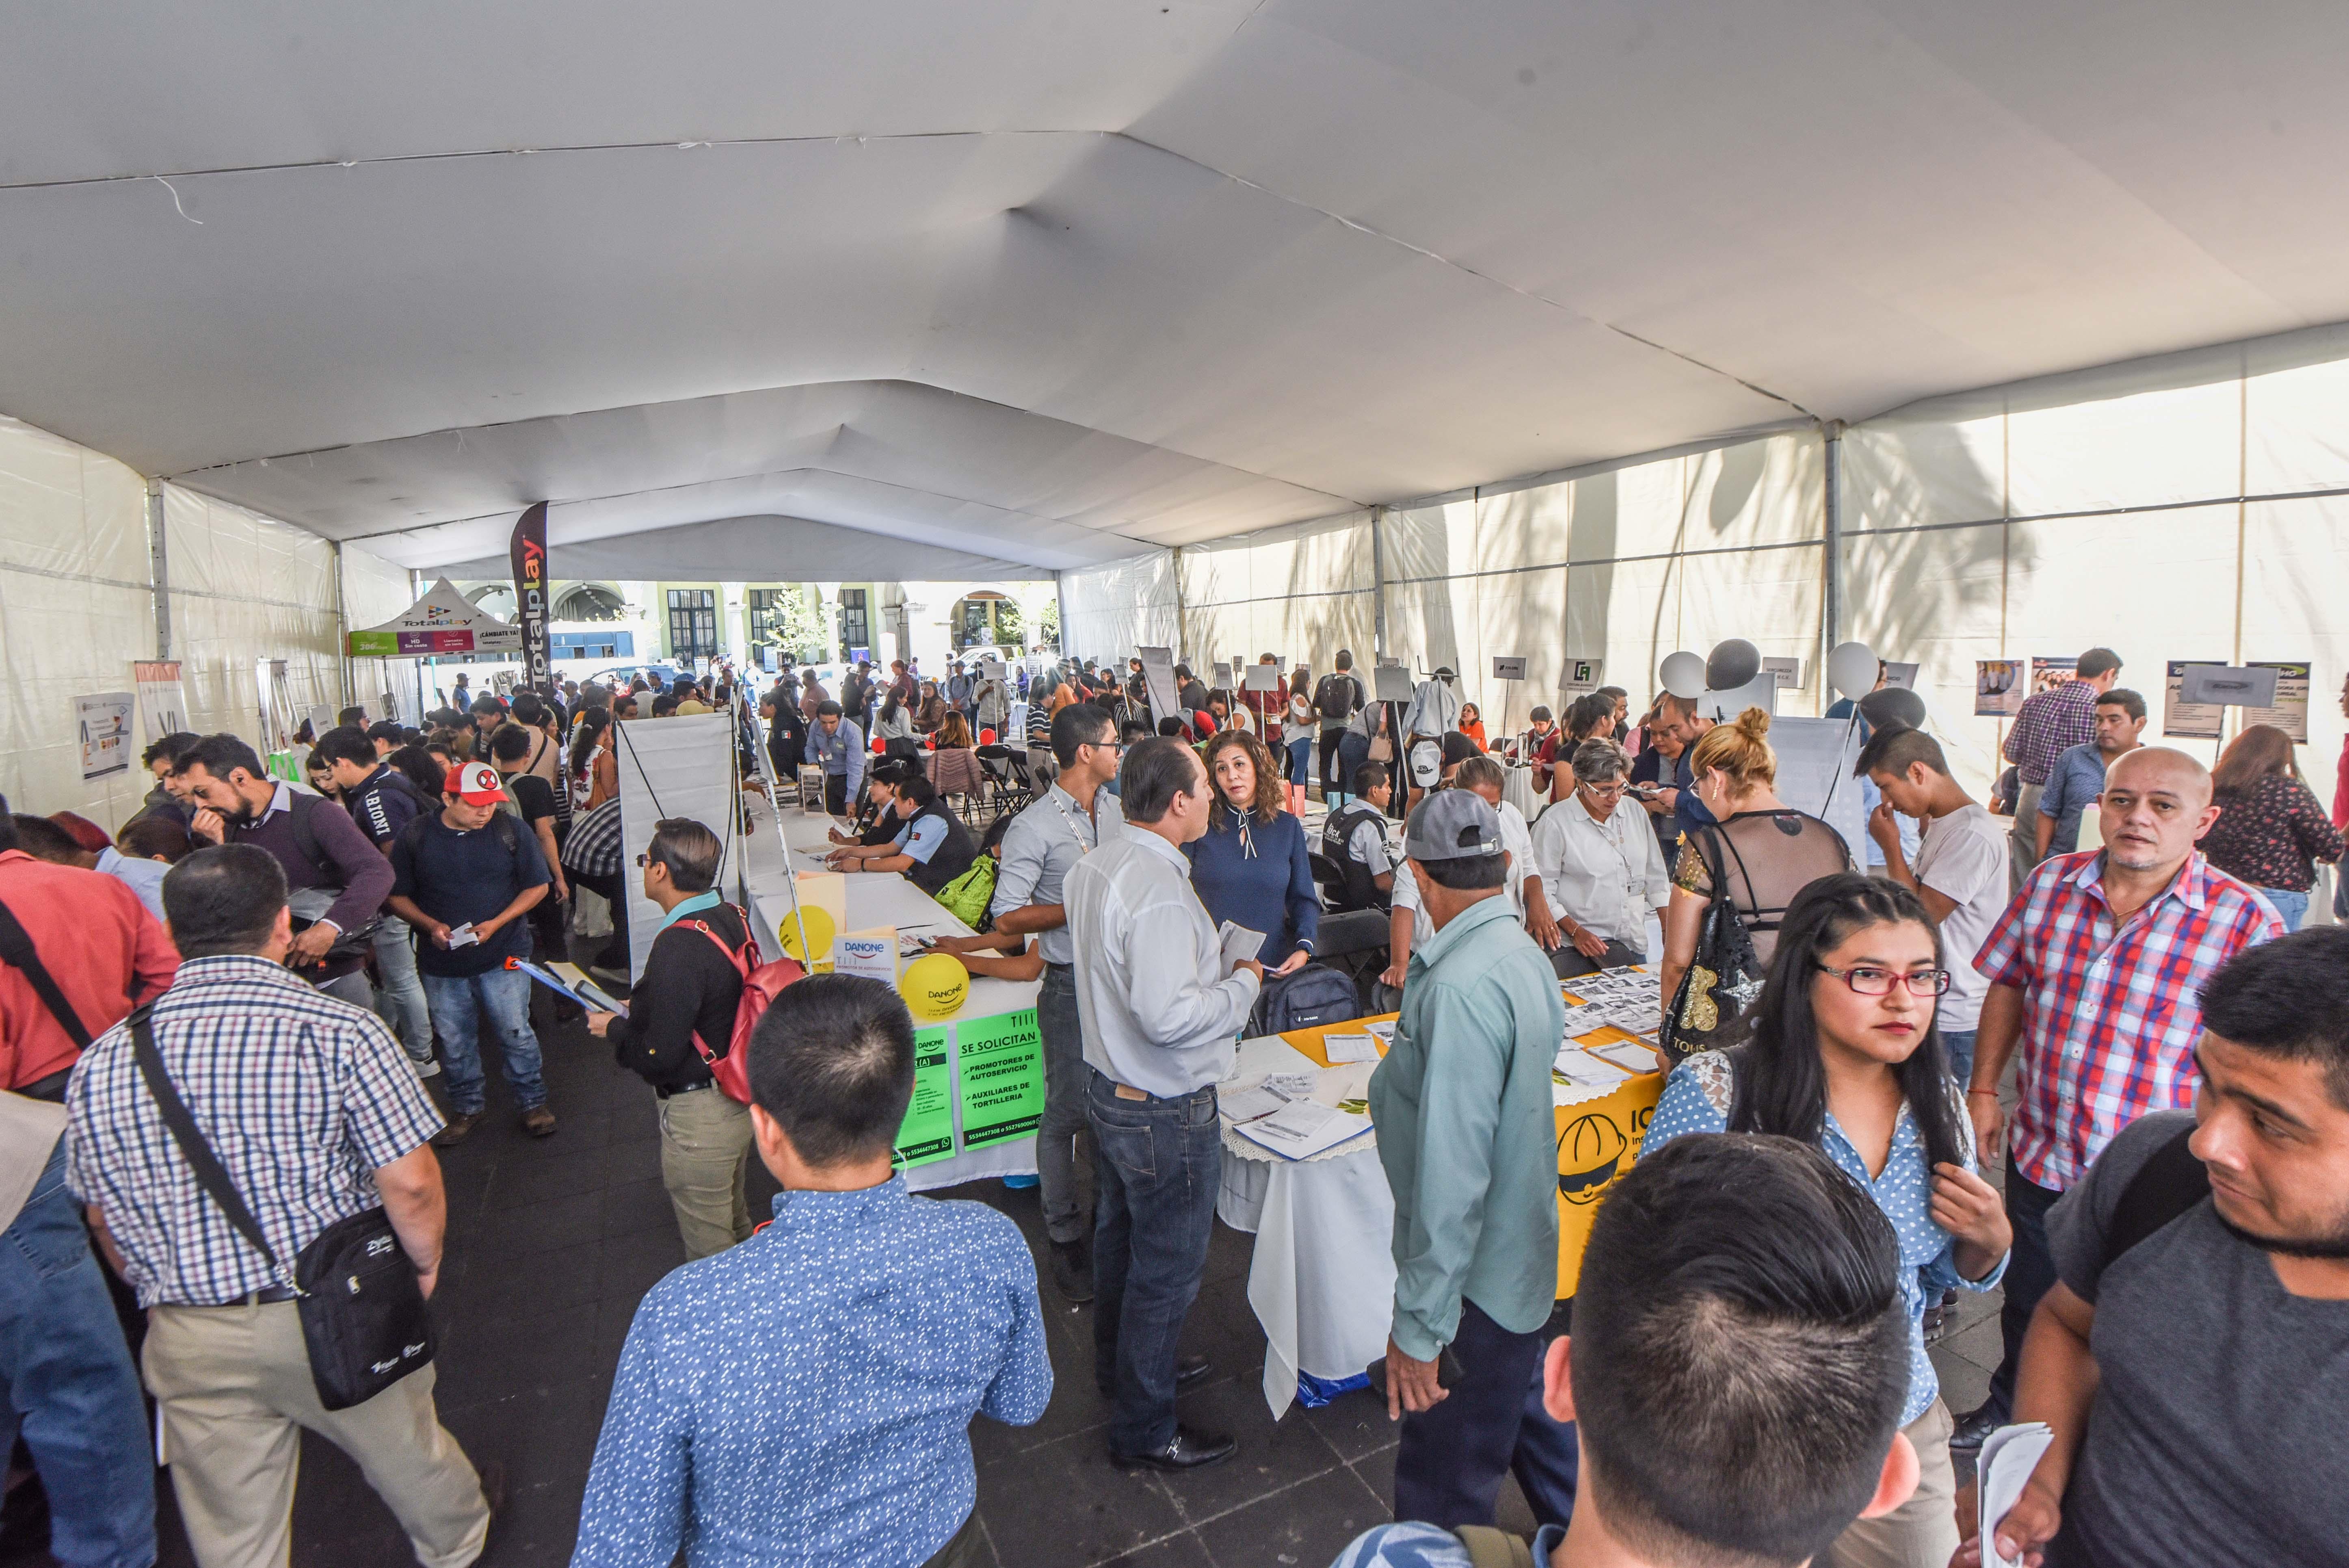 Más de 400 vacantes ofertadas en 2da Feria de Empleo, en Xalapa